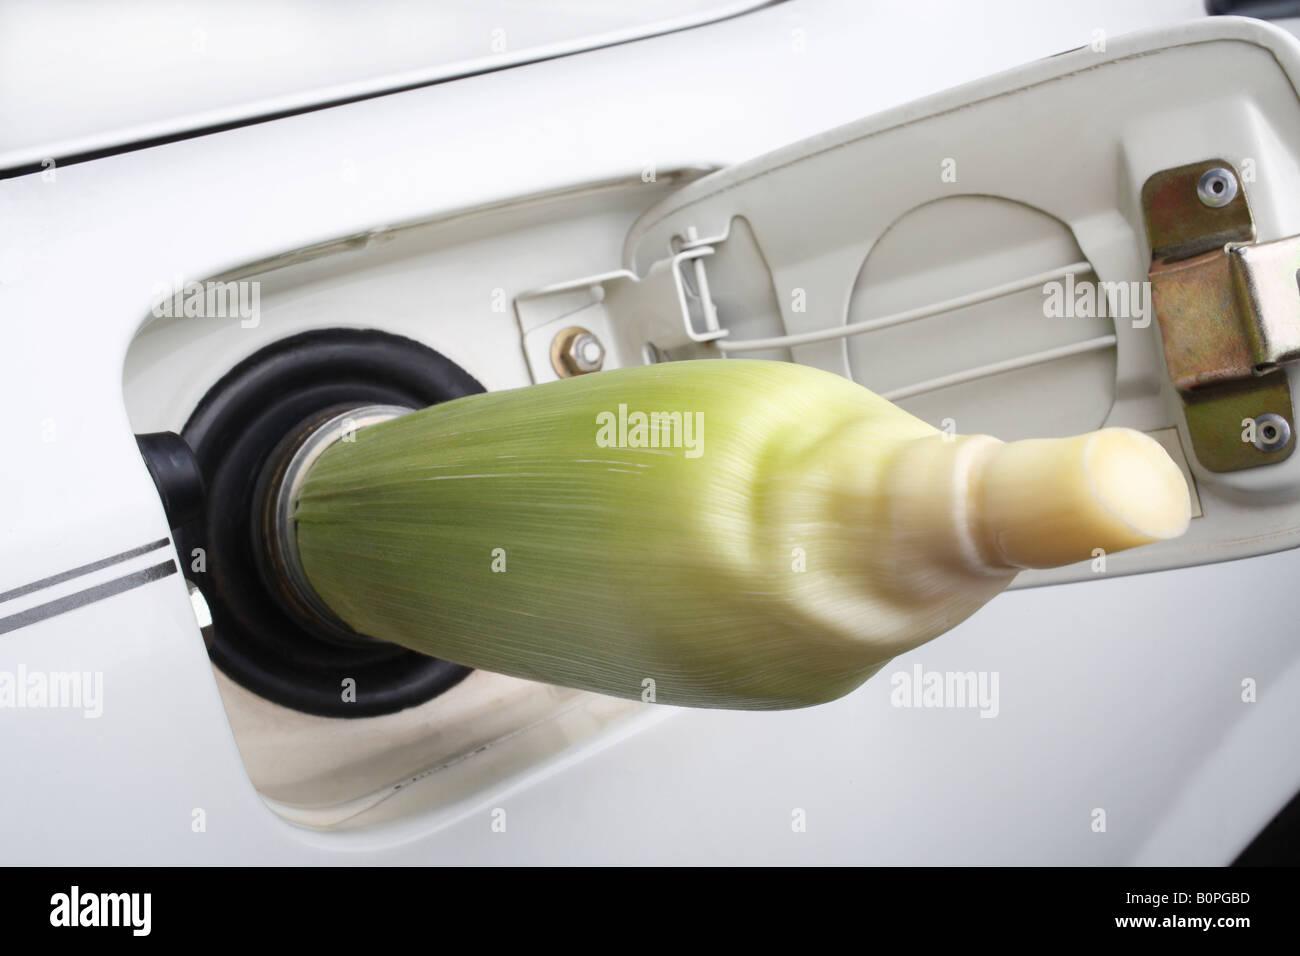 Corn cob in car gas tank filler